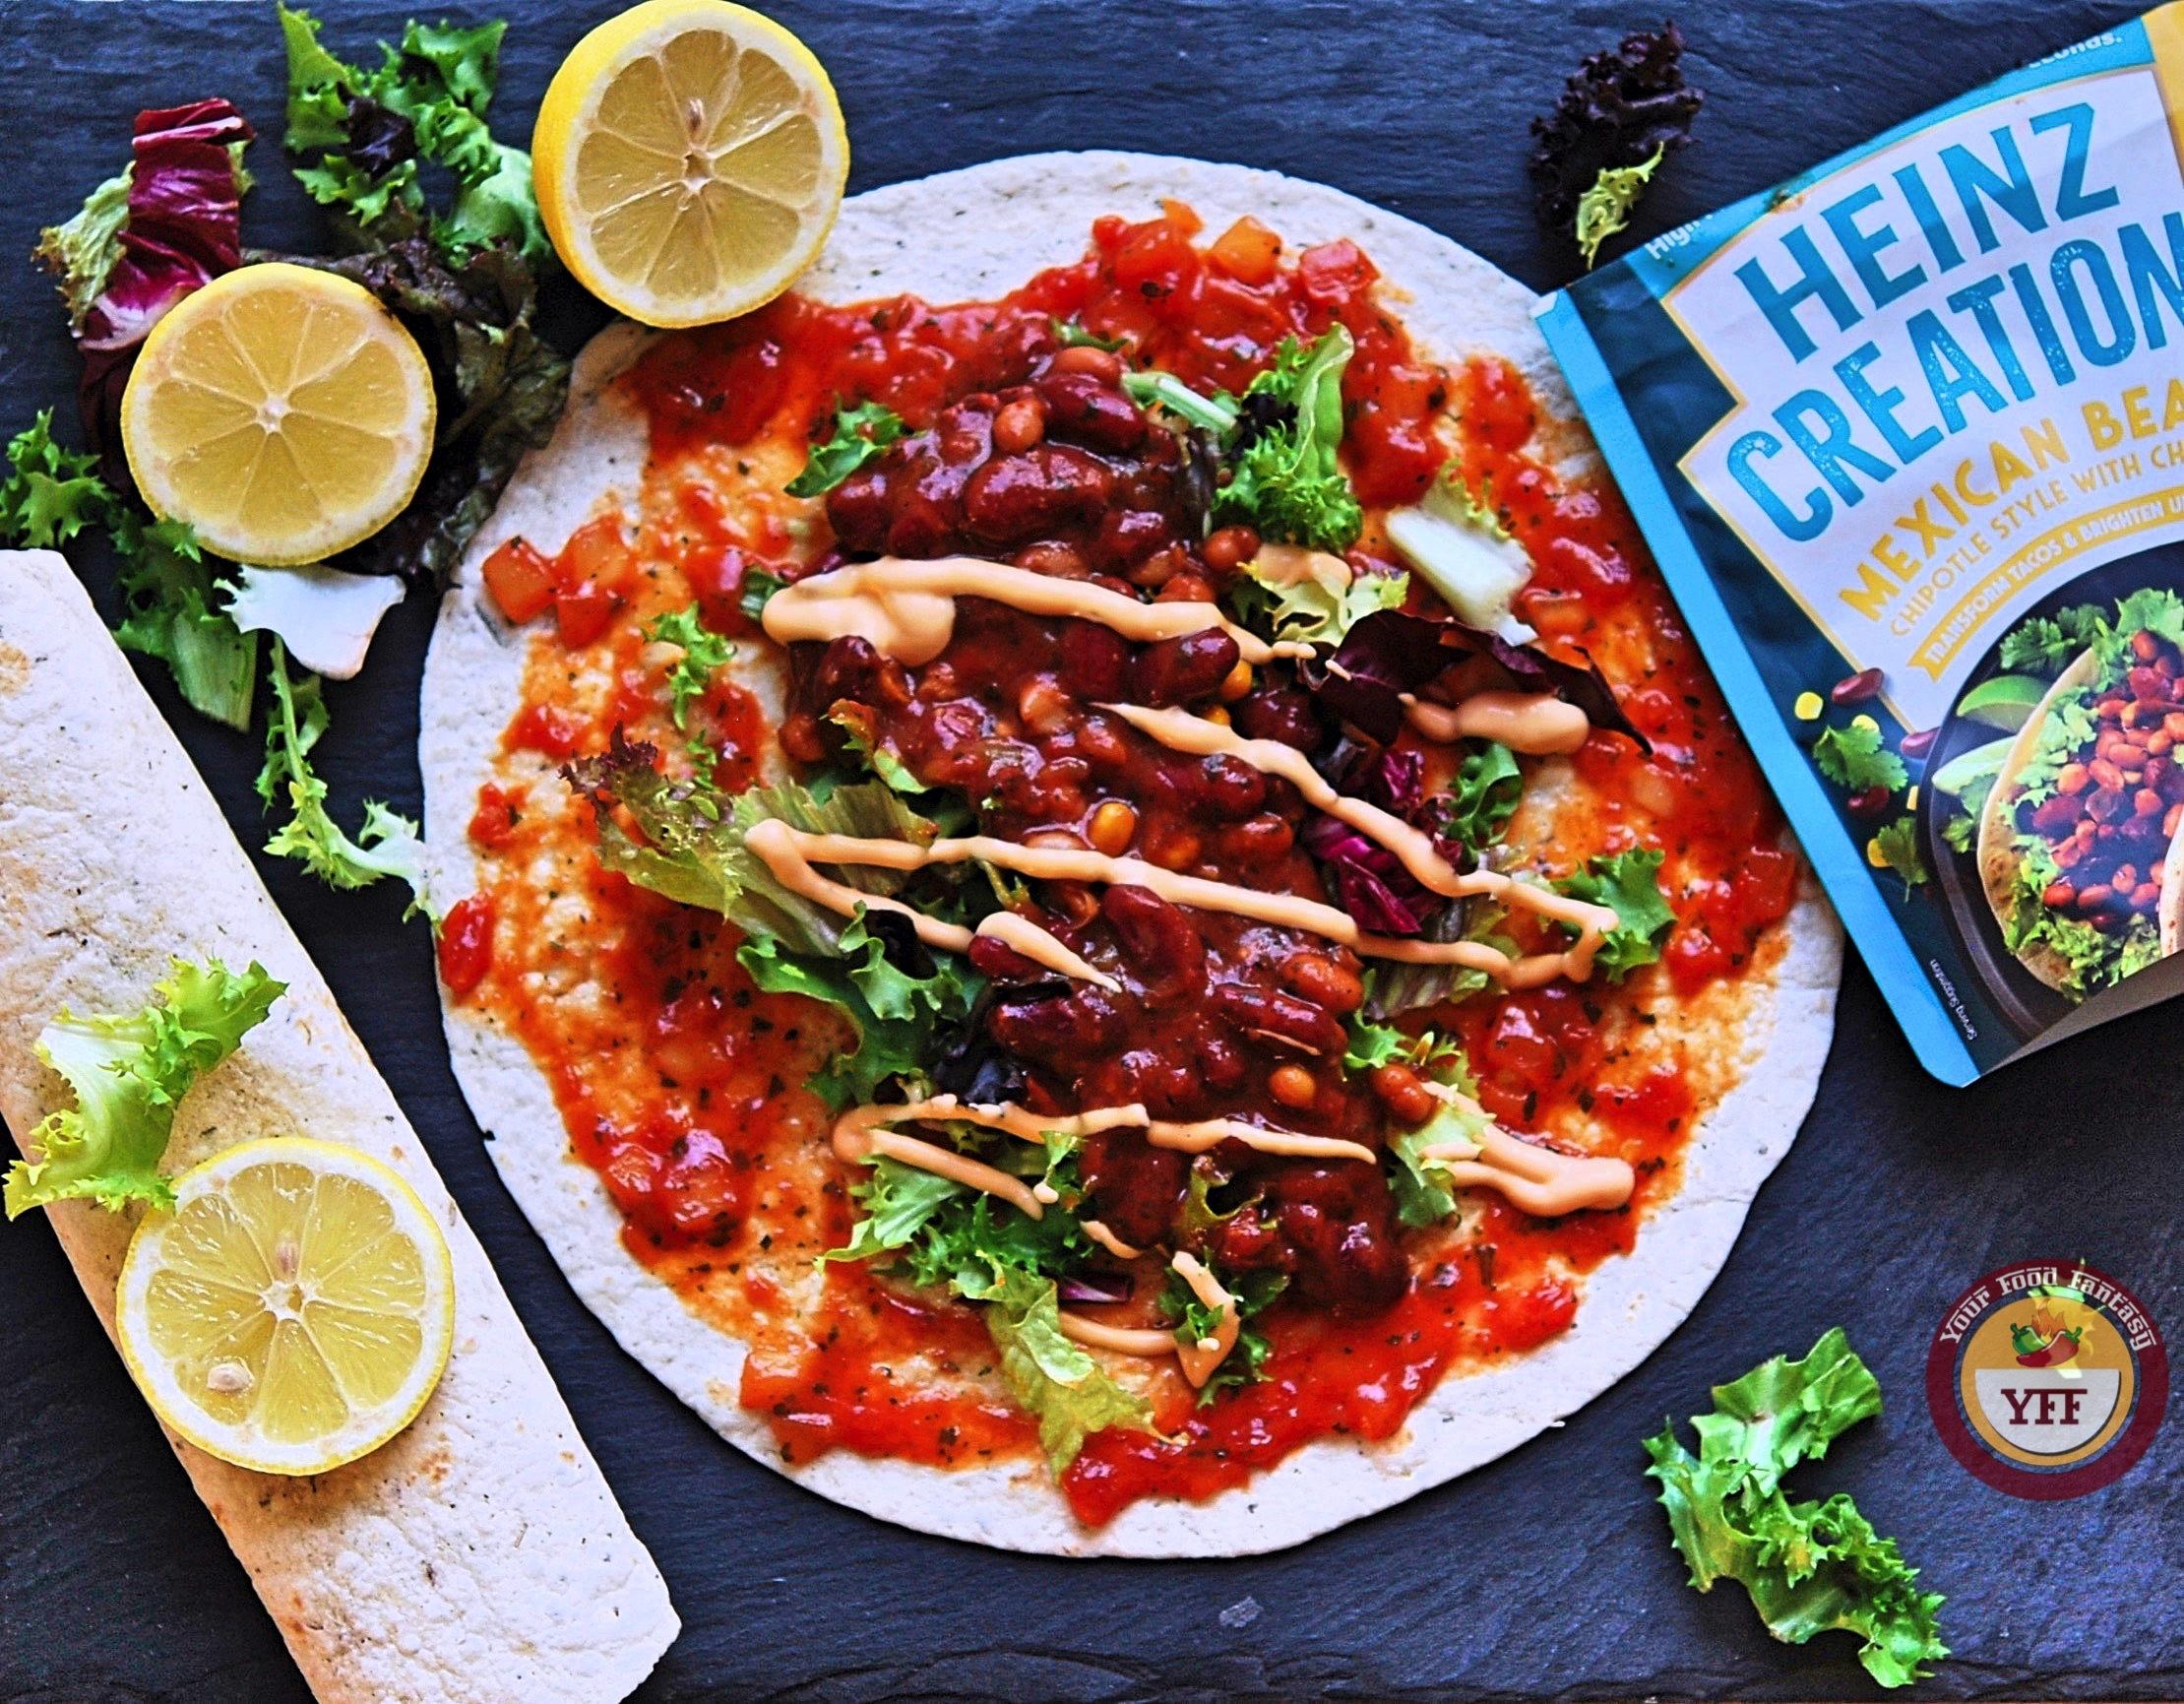 Heinz Creationz Maxican Beanz Review | Degustax Box Review | Your Food Fantasy